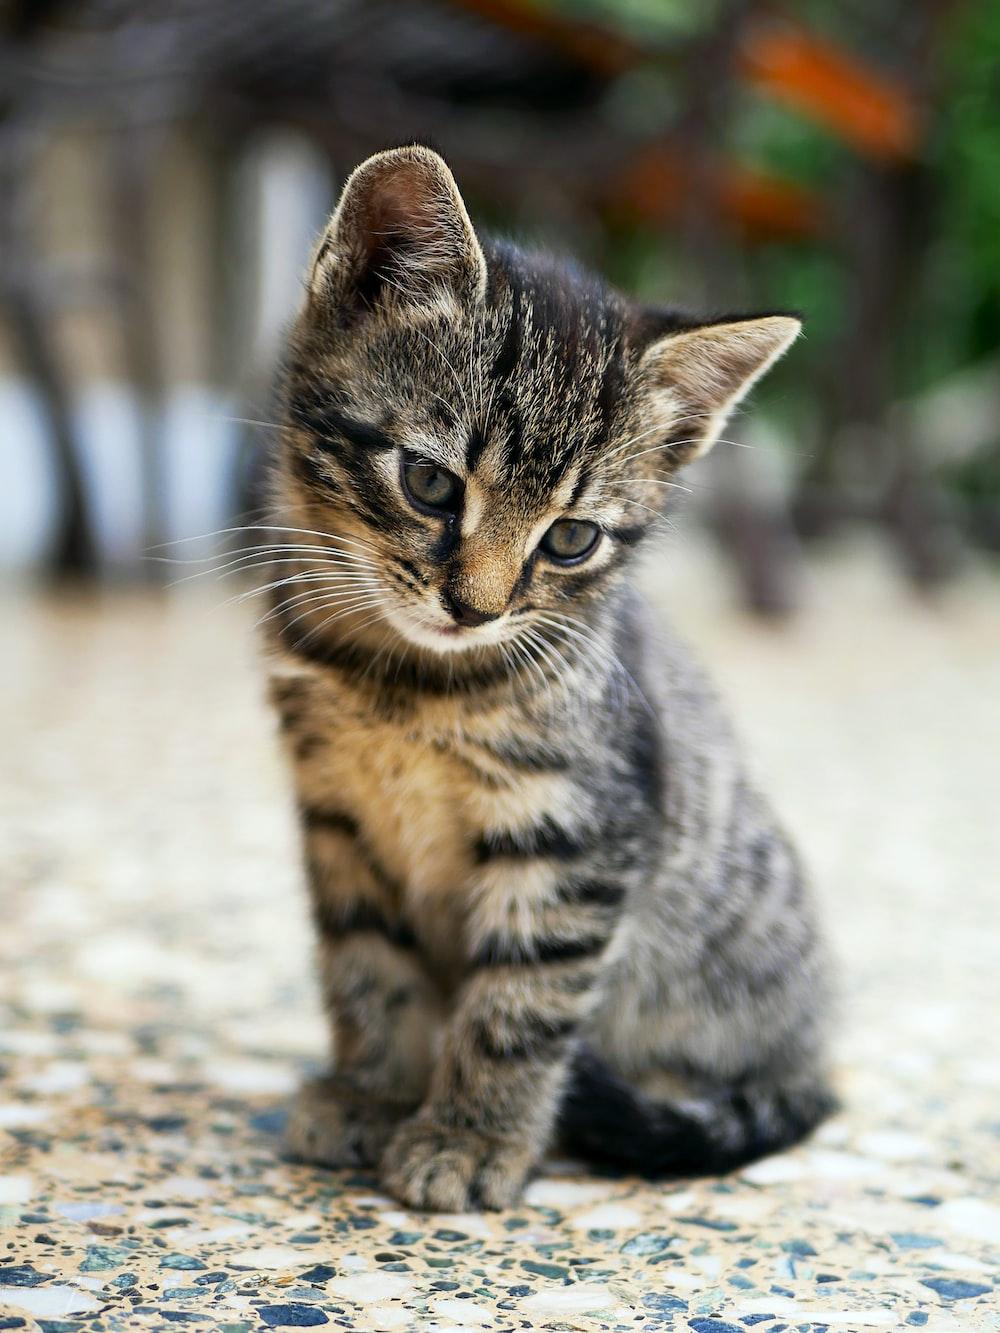 brown tabby kitten sitting on floor